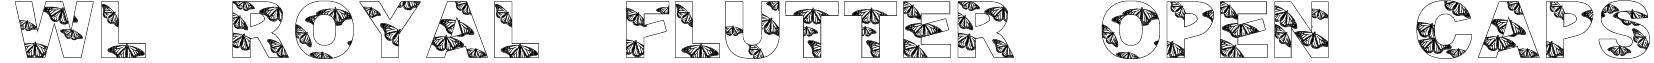 WL Royal Flutter Open Caps Font